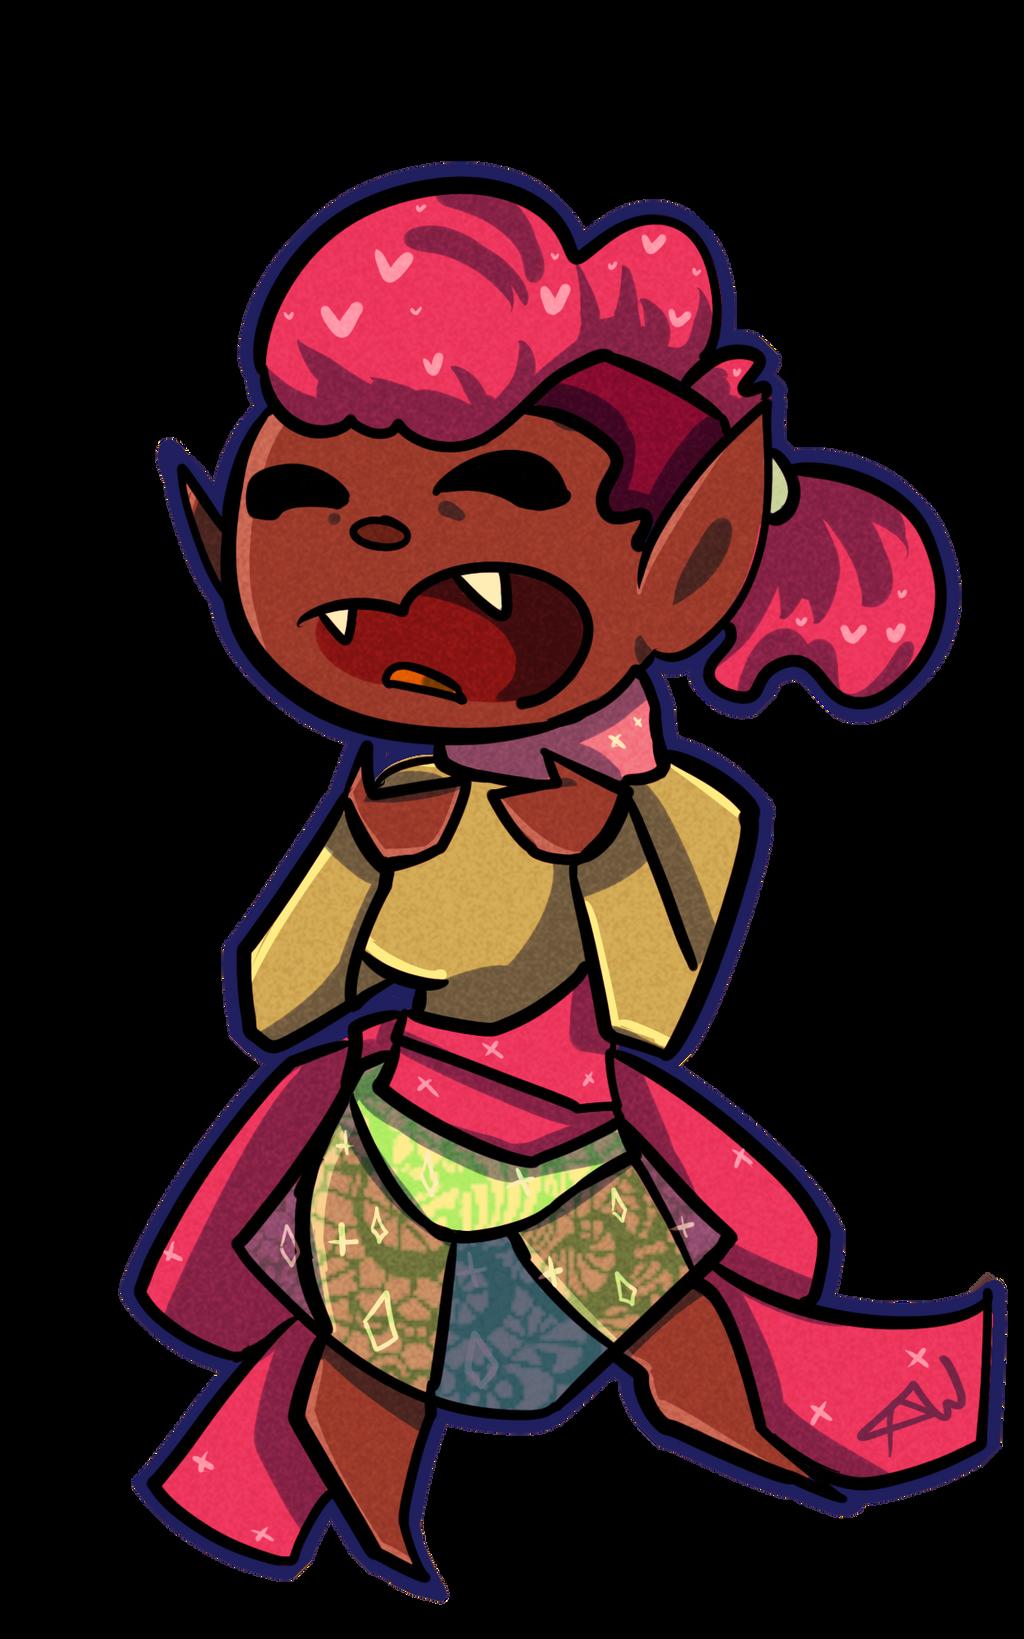 Chibi vamp by royalshame